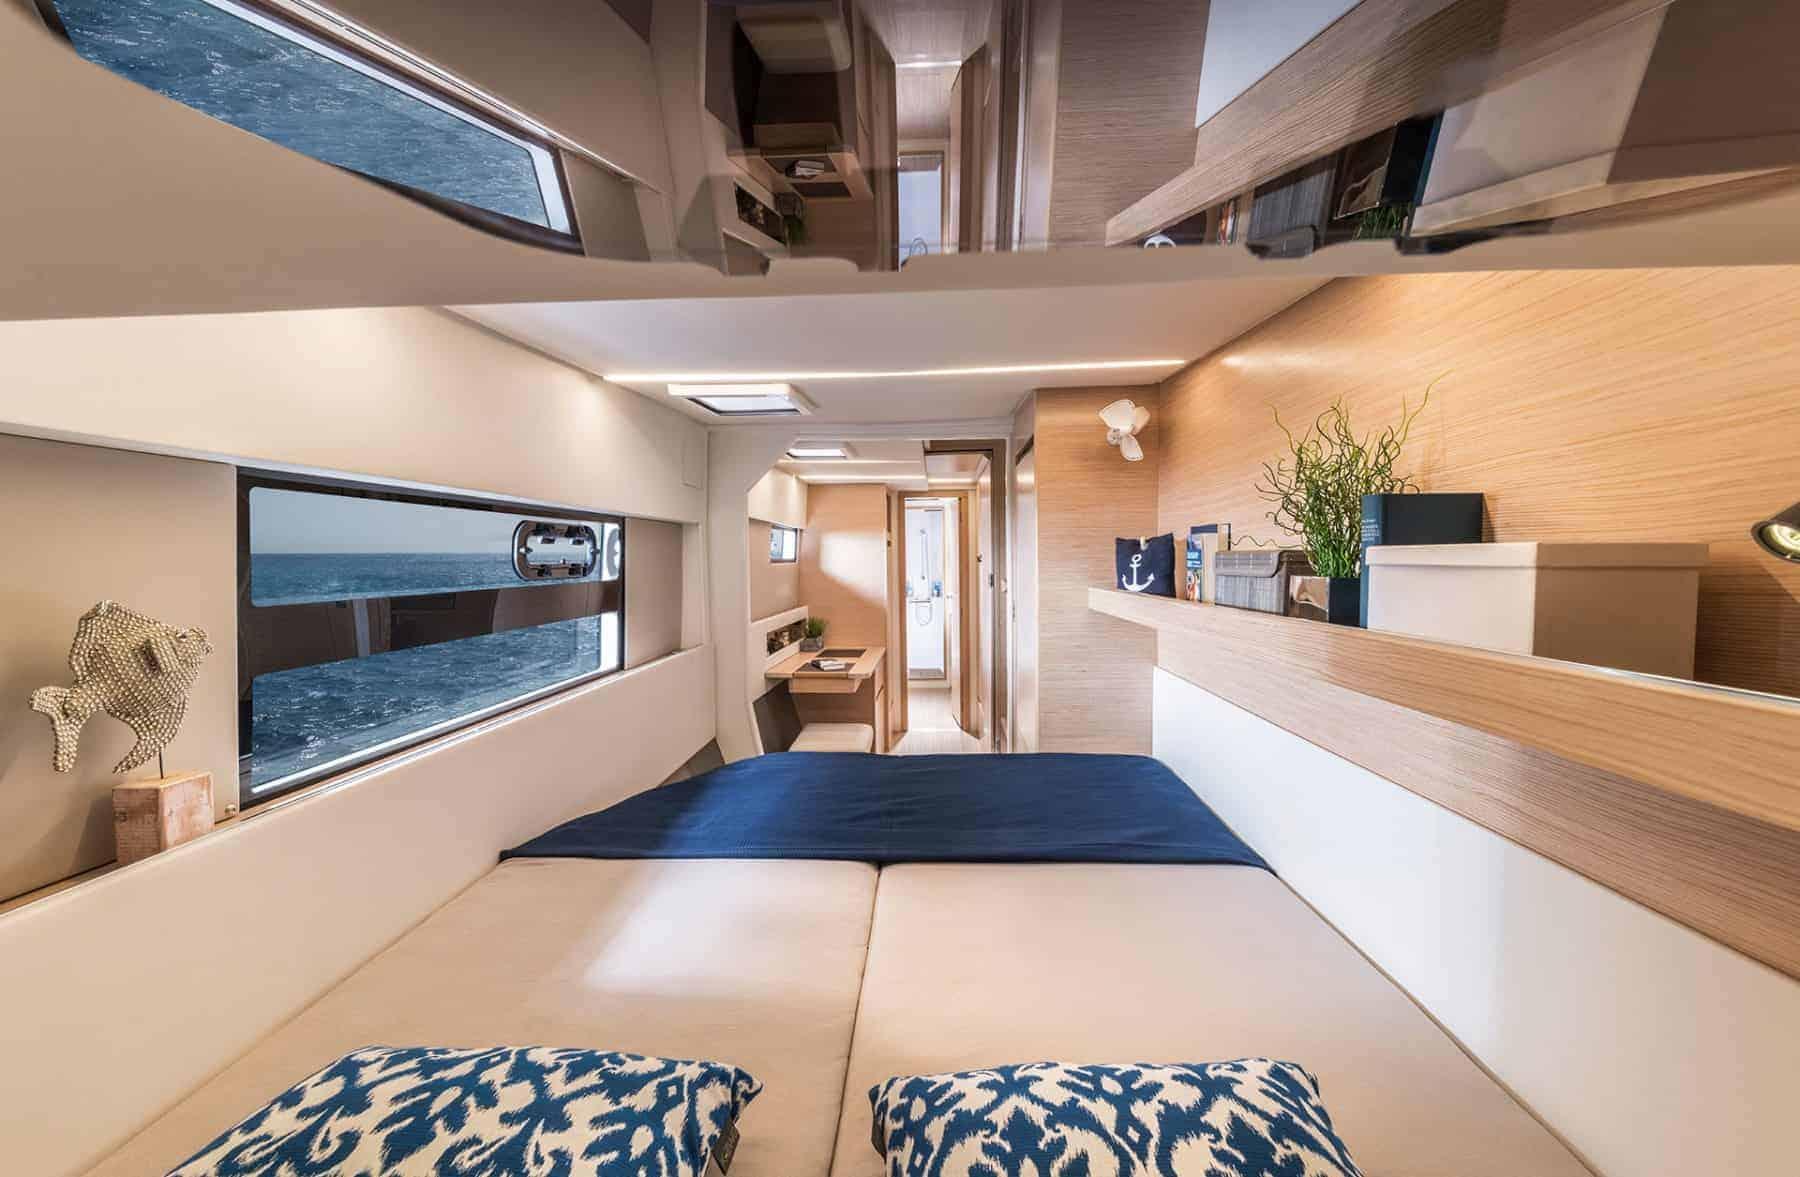 Bavaria-Nautitech-40-open-interior-cabin-2-charter-ownership-yacht